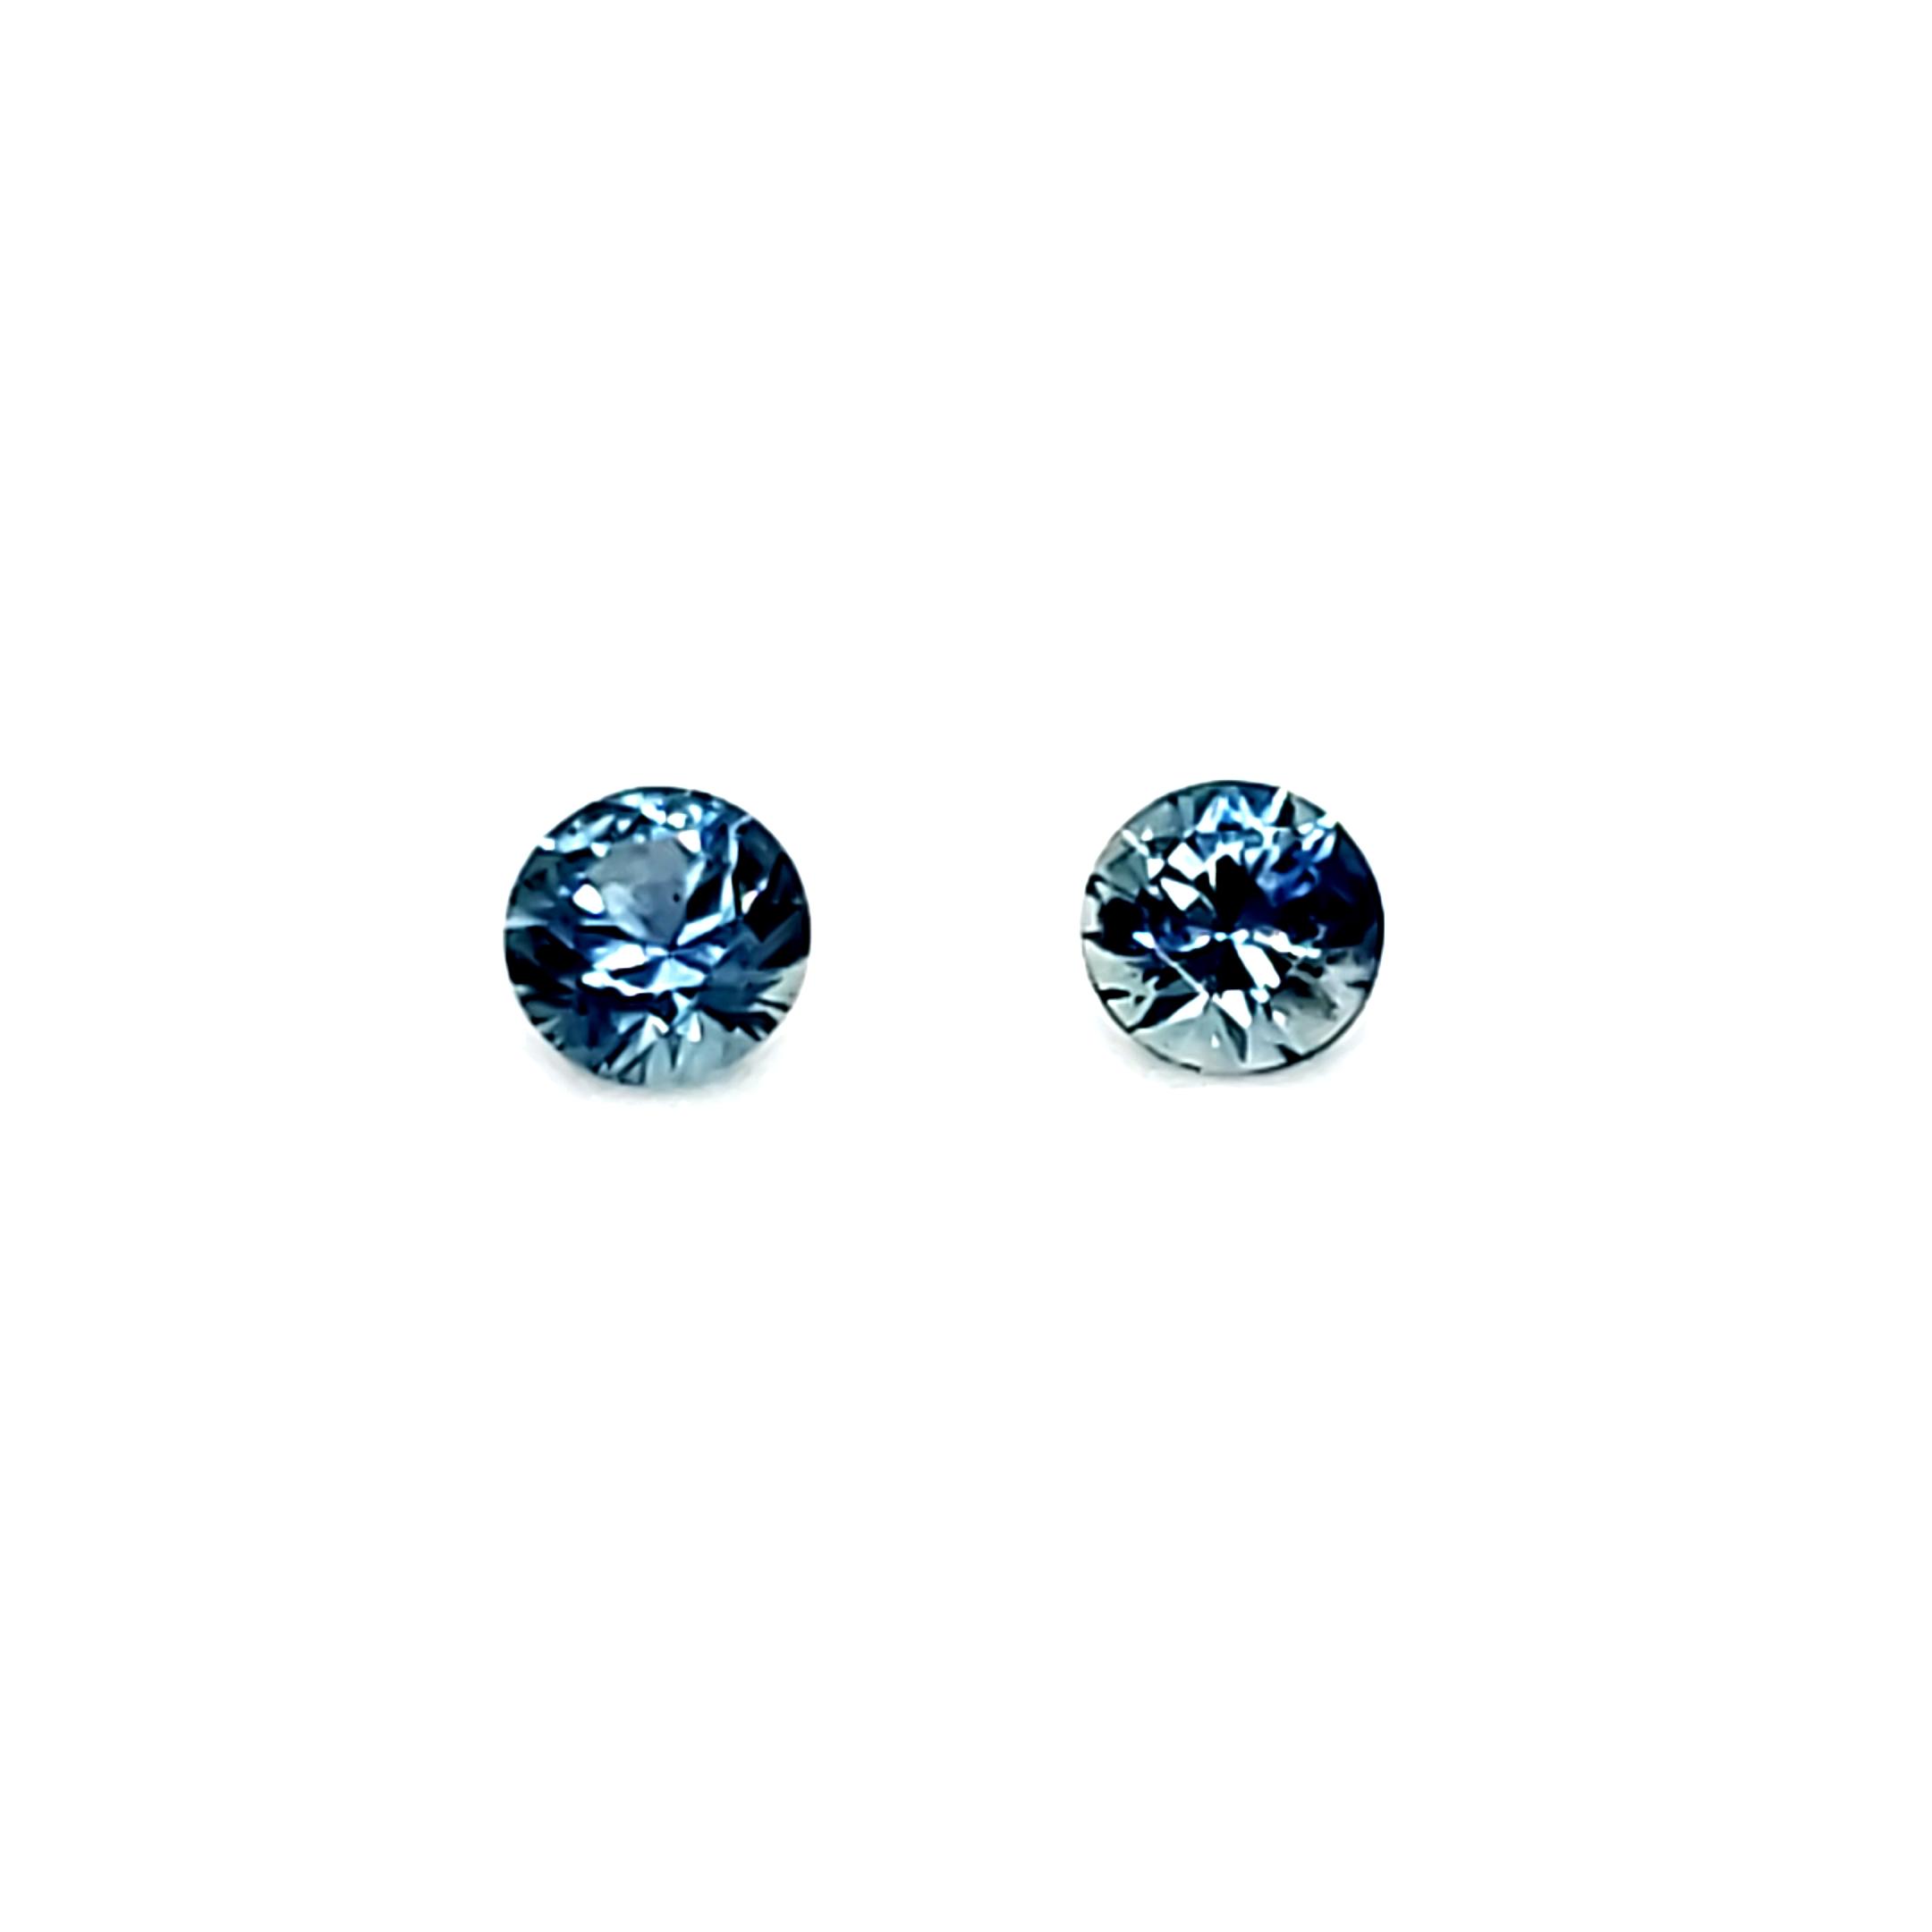 .68 tcw Montana Blue Sapphire Pair